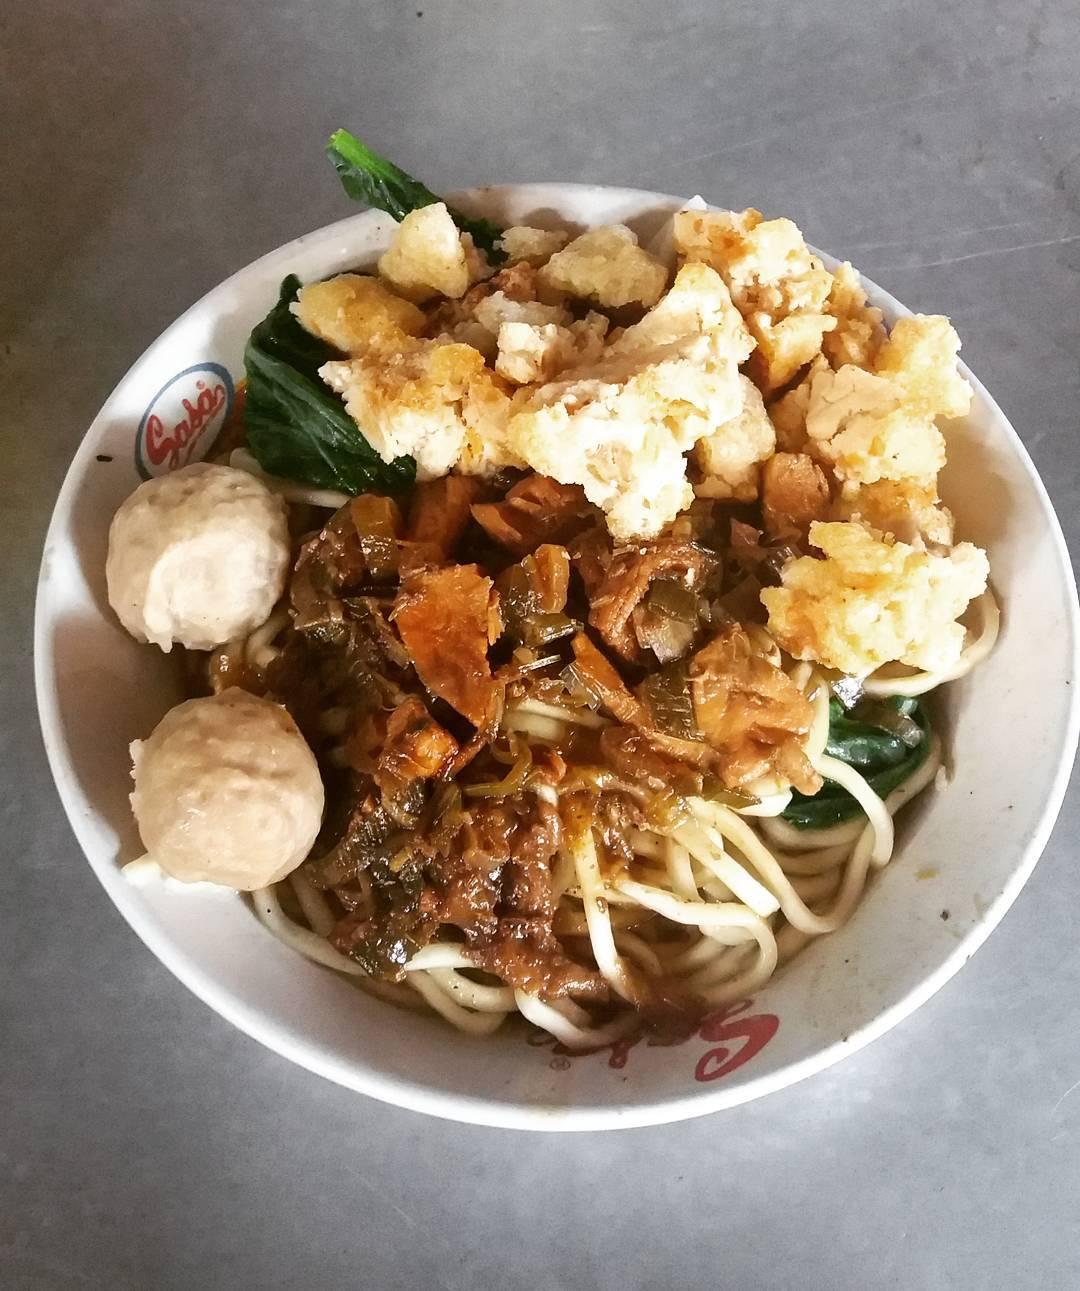 Mie Ayam Sendowo, Mie Ayam Sendowo Yogyakarta, Yogyakarta, Dolan Dolen, Dolaners Mie Ayam Sendowo via widya jelitahati - Dolan Dolen